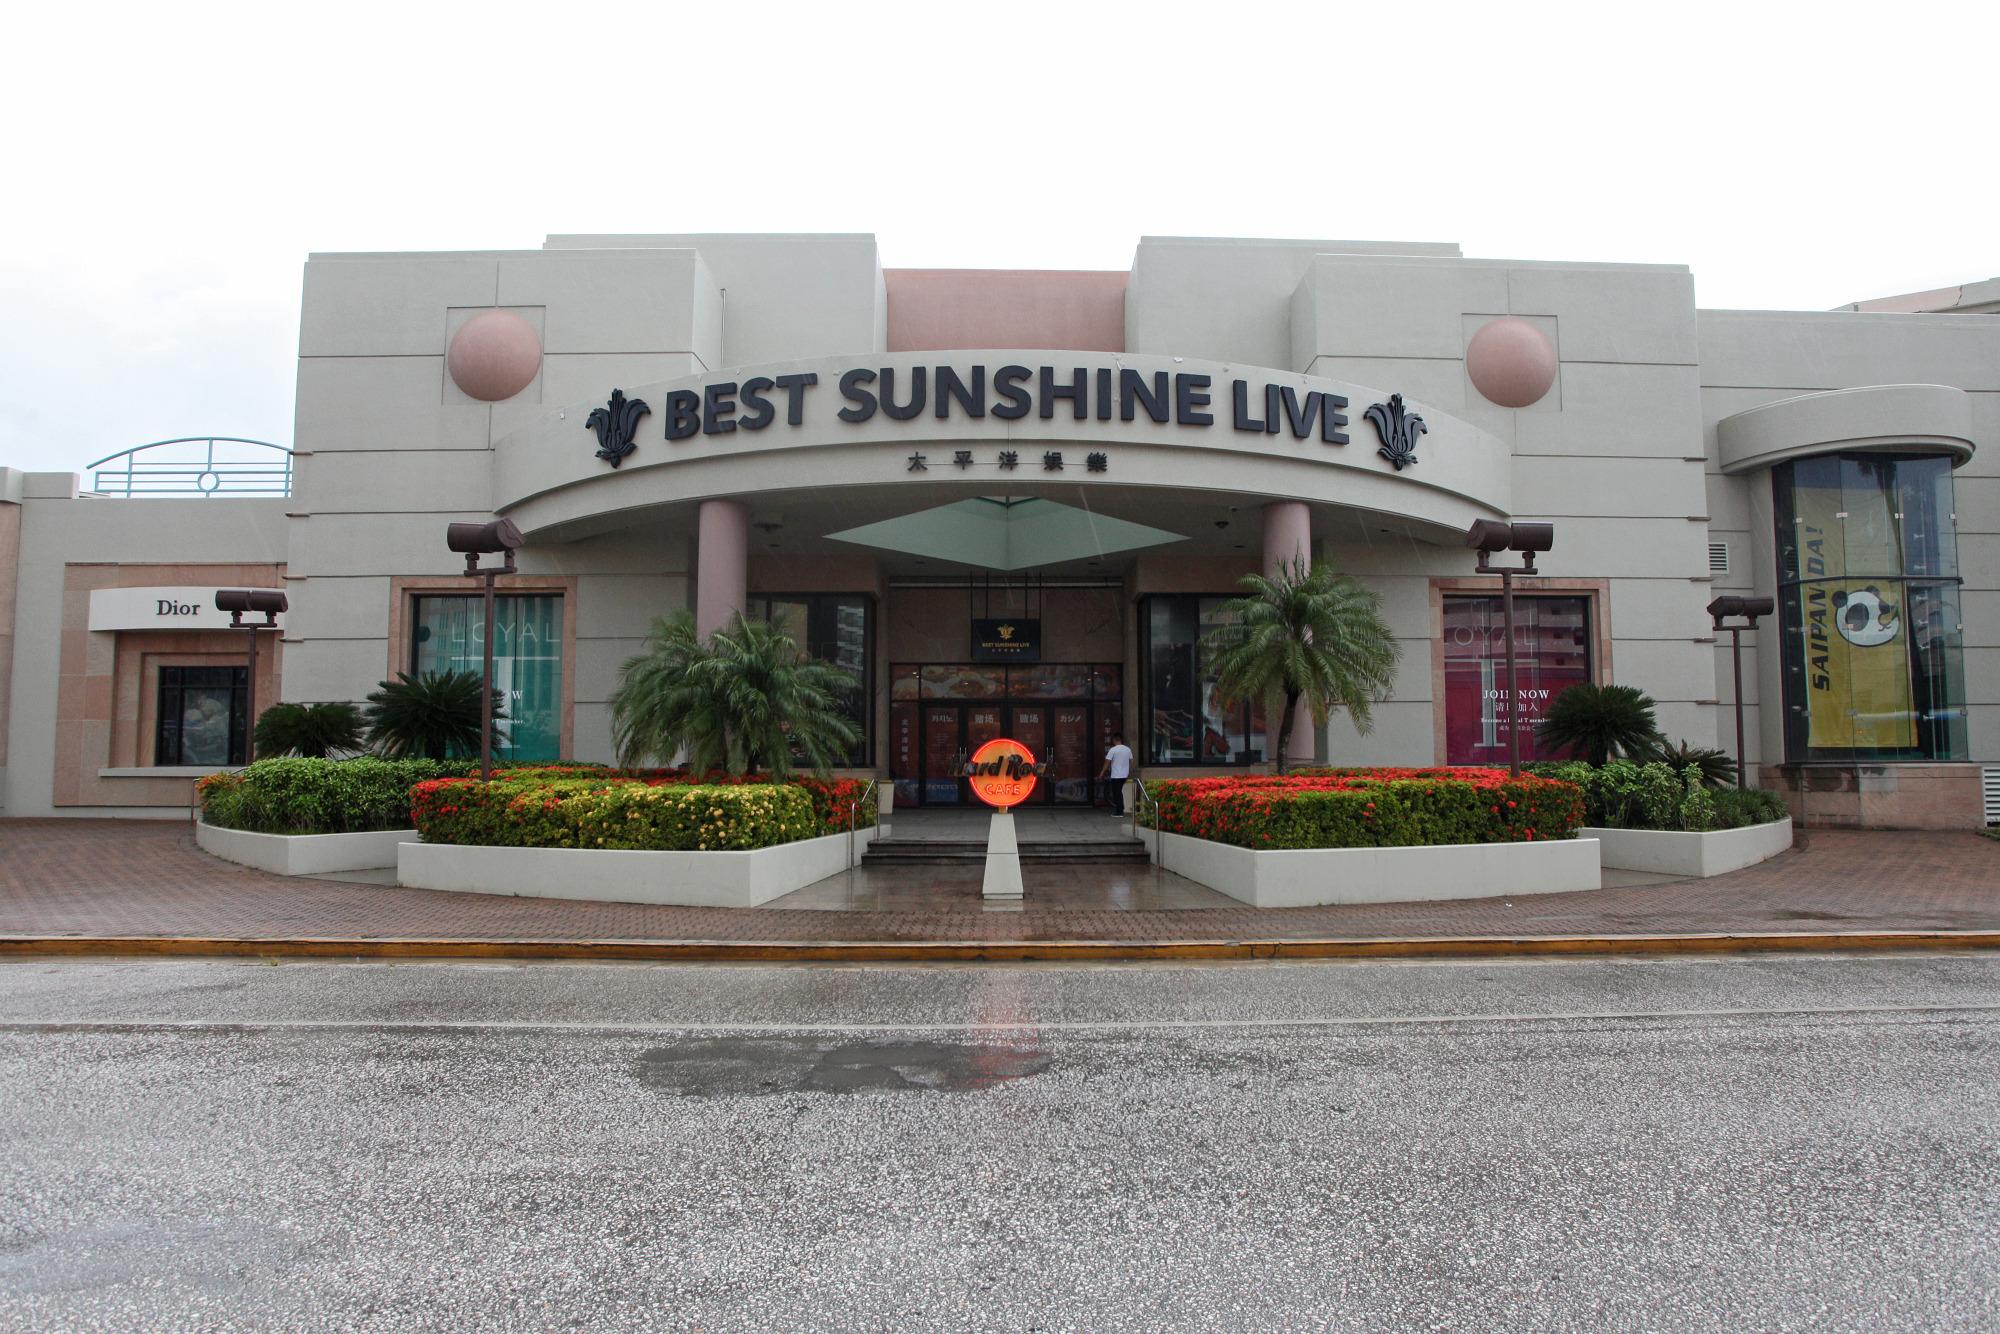 The Best Sunshine Live casino.